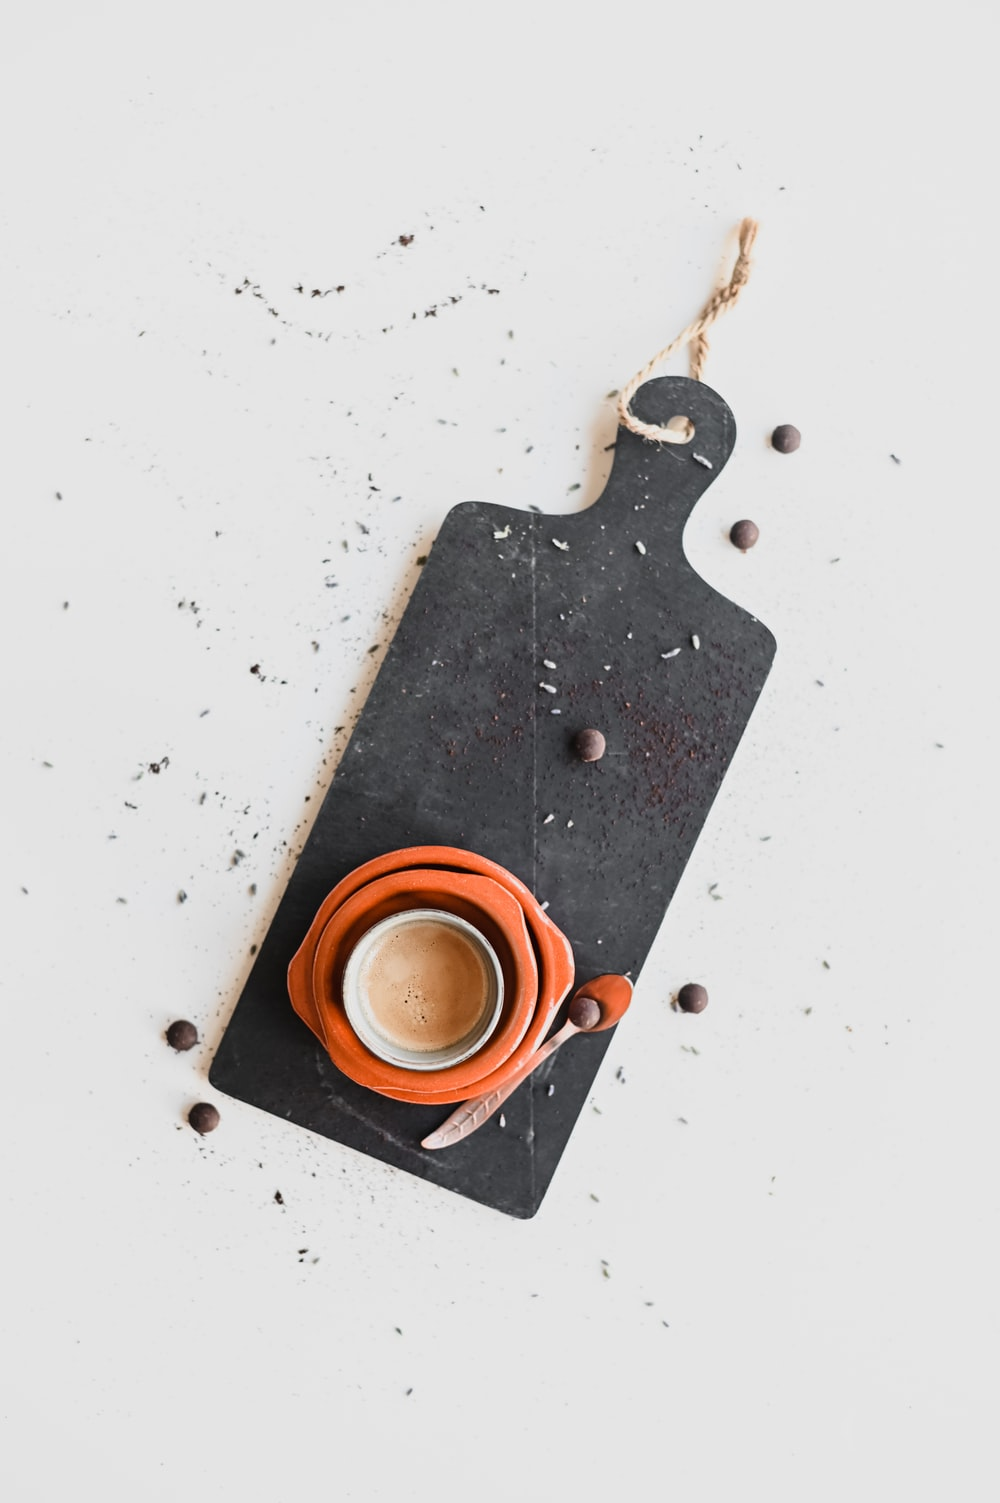 black and brown metal tool